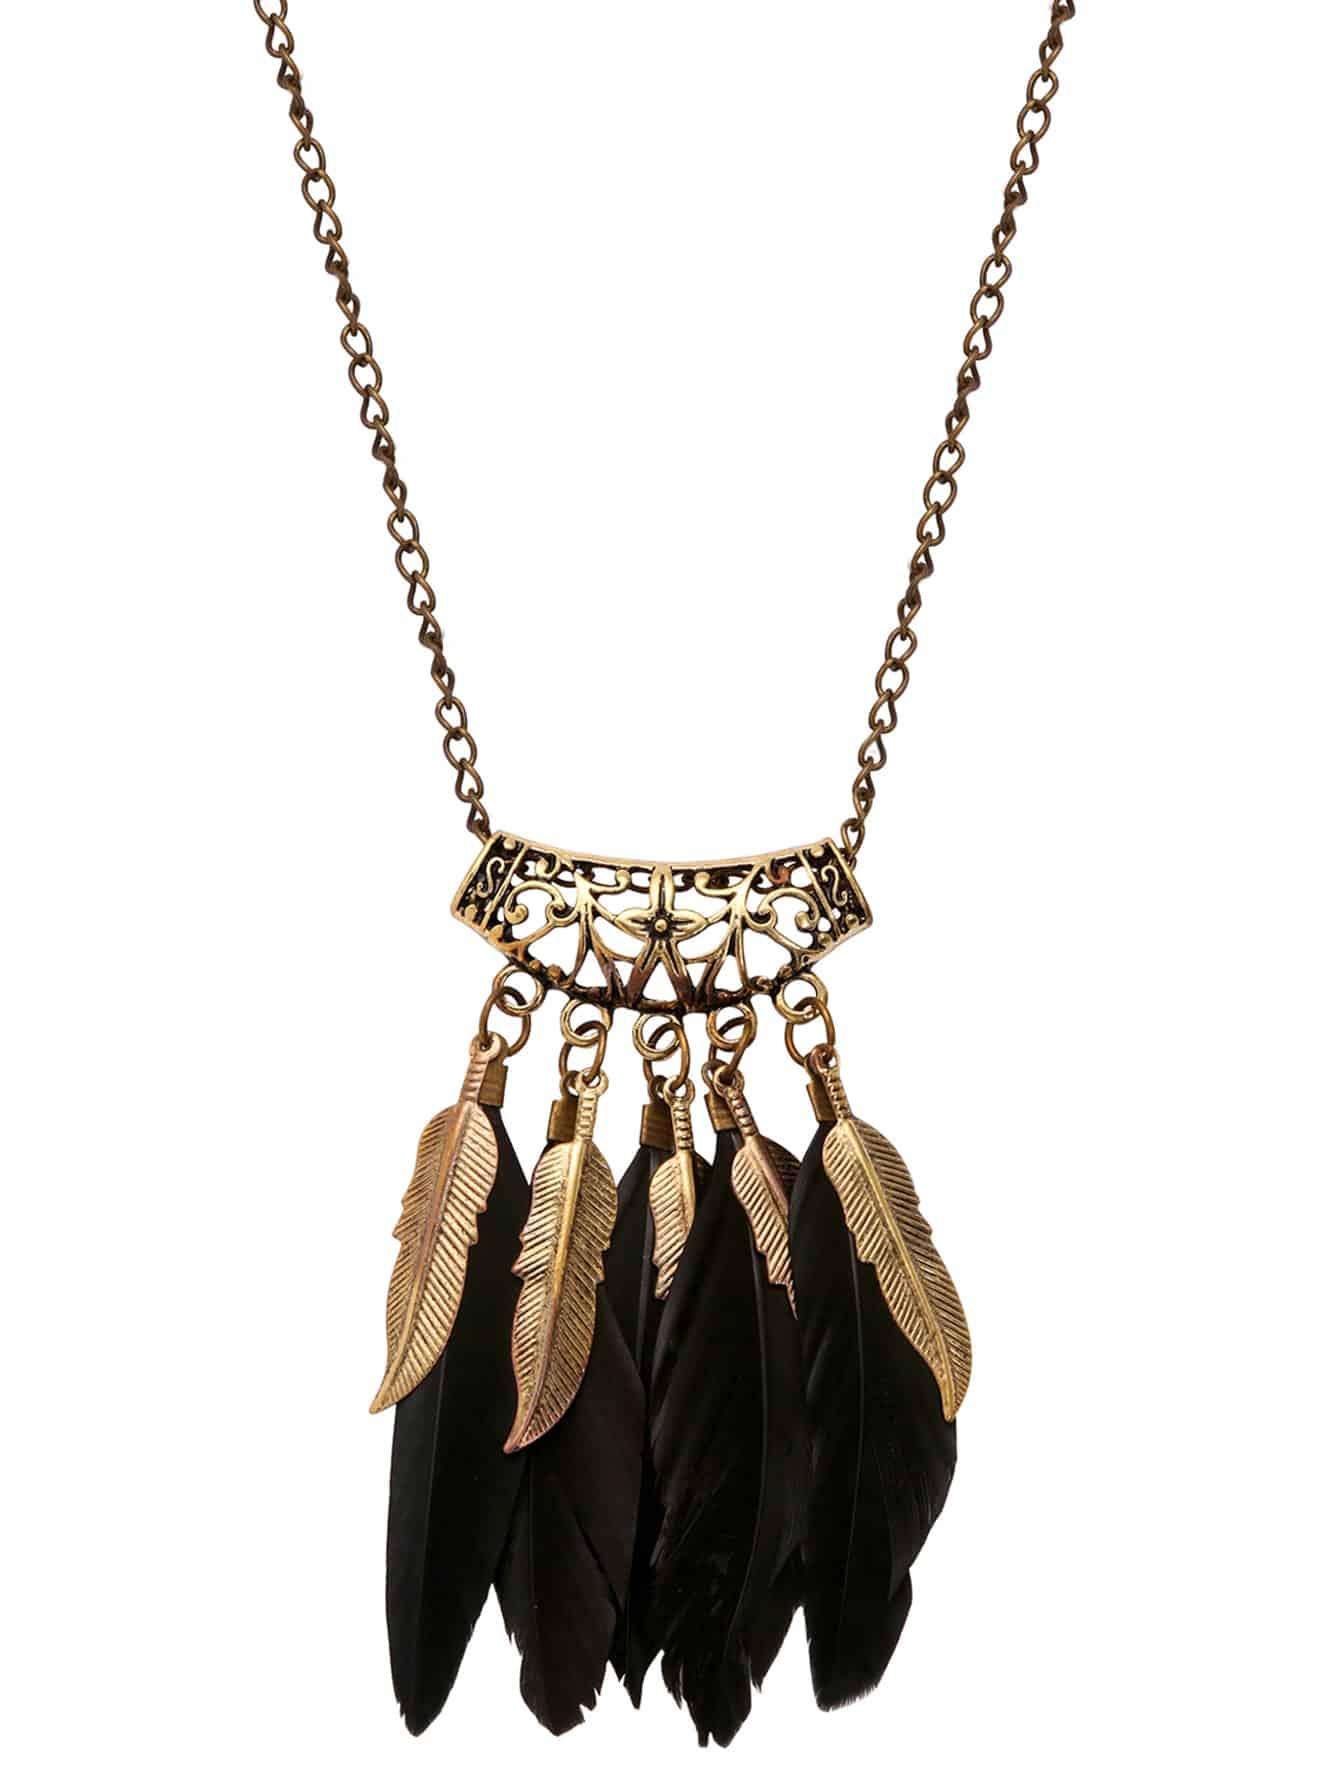 Black Feather Pendant Necklace